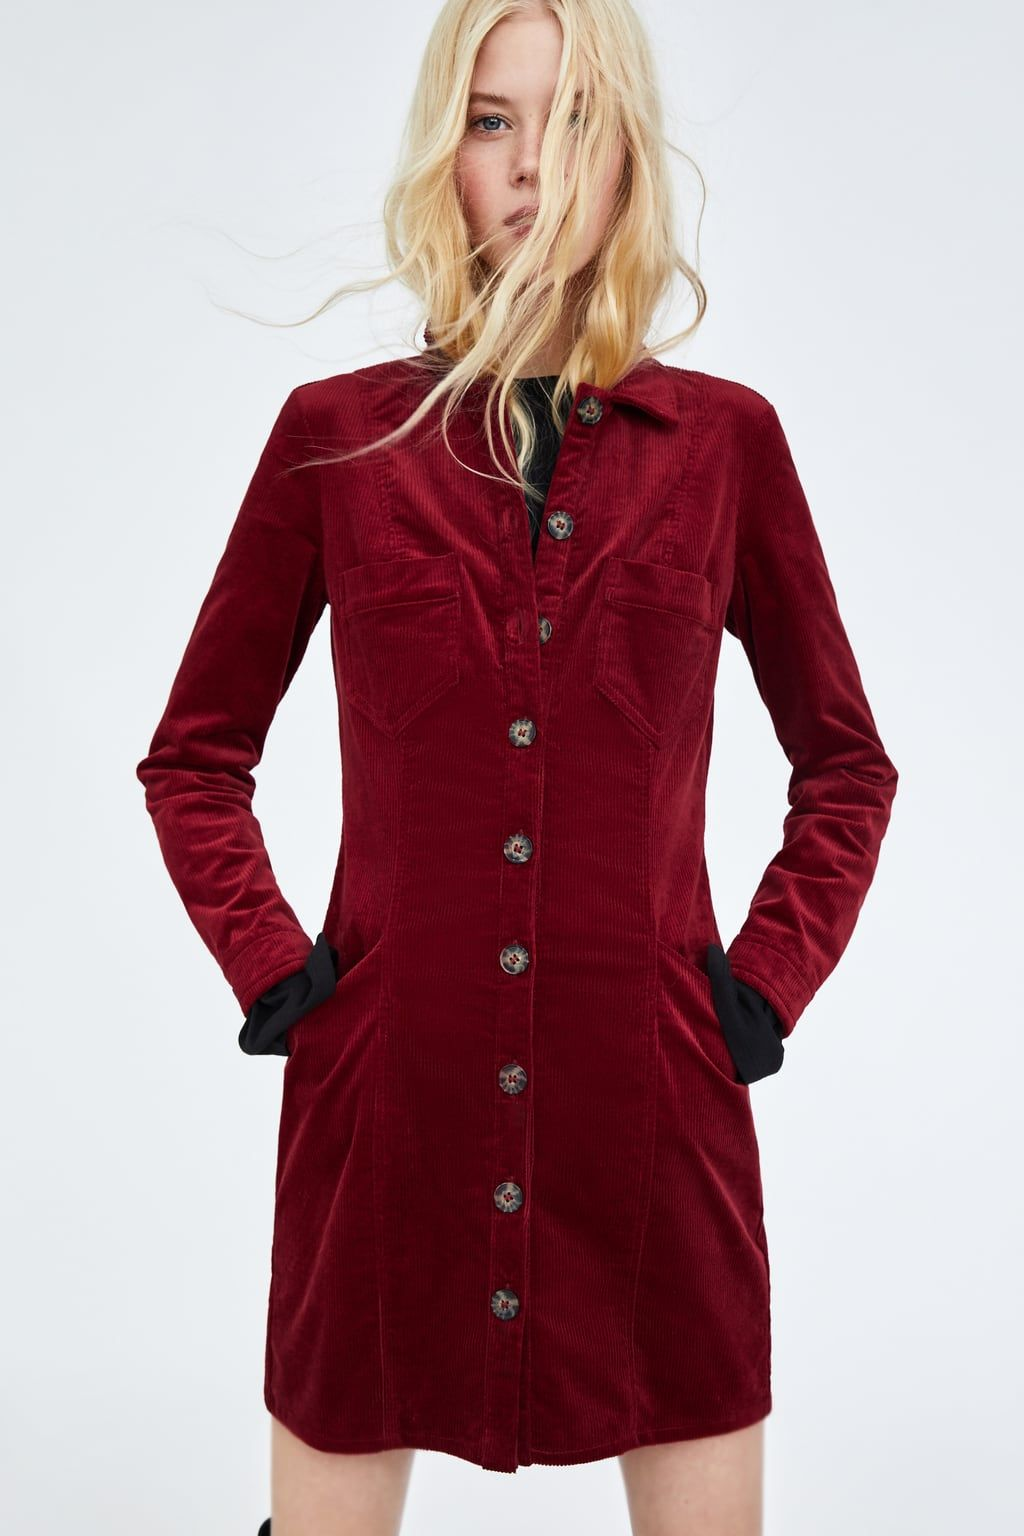 Zara Dan 2 Fitilli Kadife Elbise Resmi Denim Fashion Corduroy Dress Dresses [ 1536 x 1024 Pixel ]